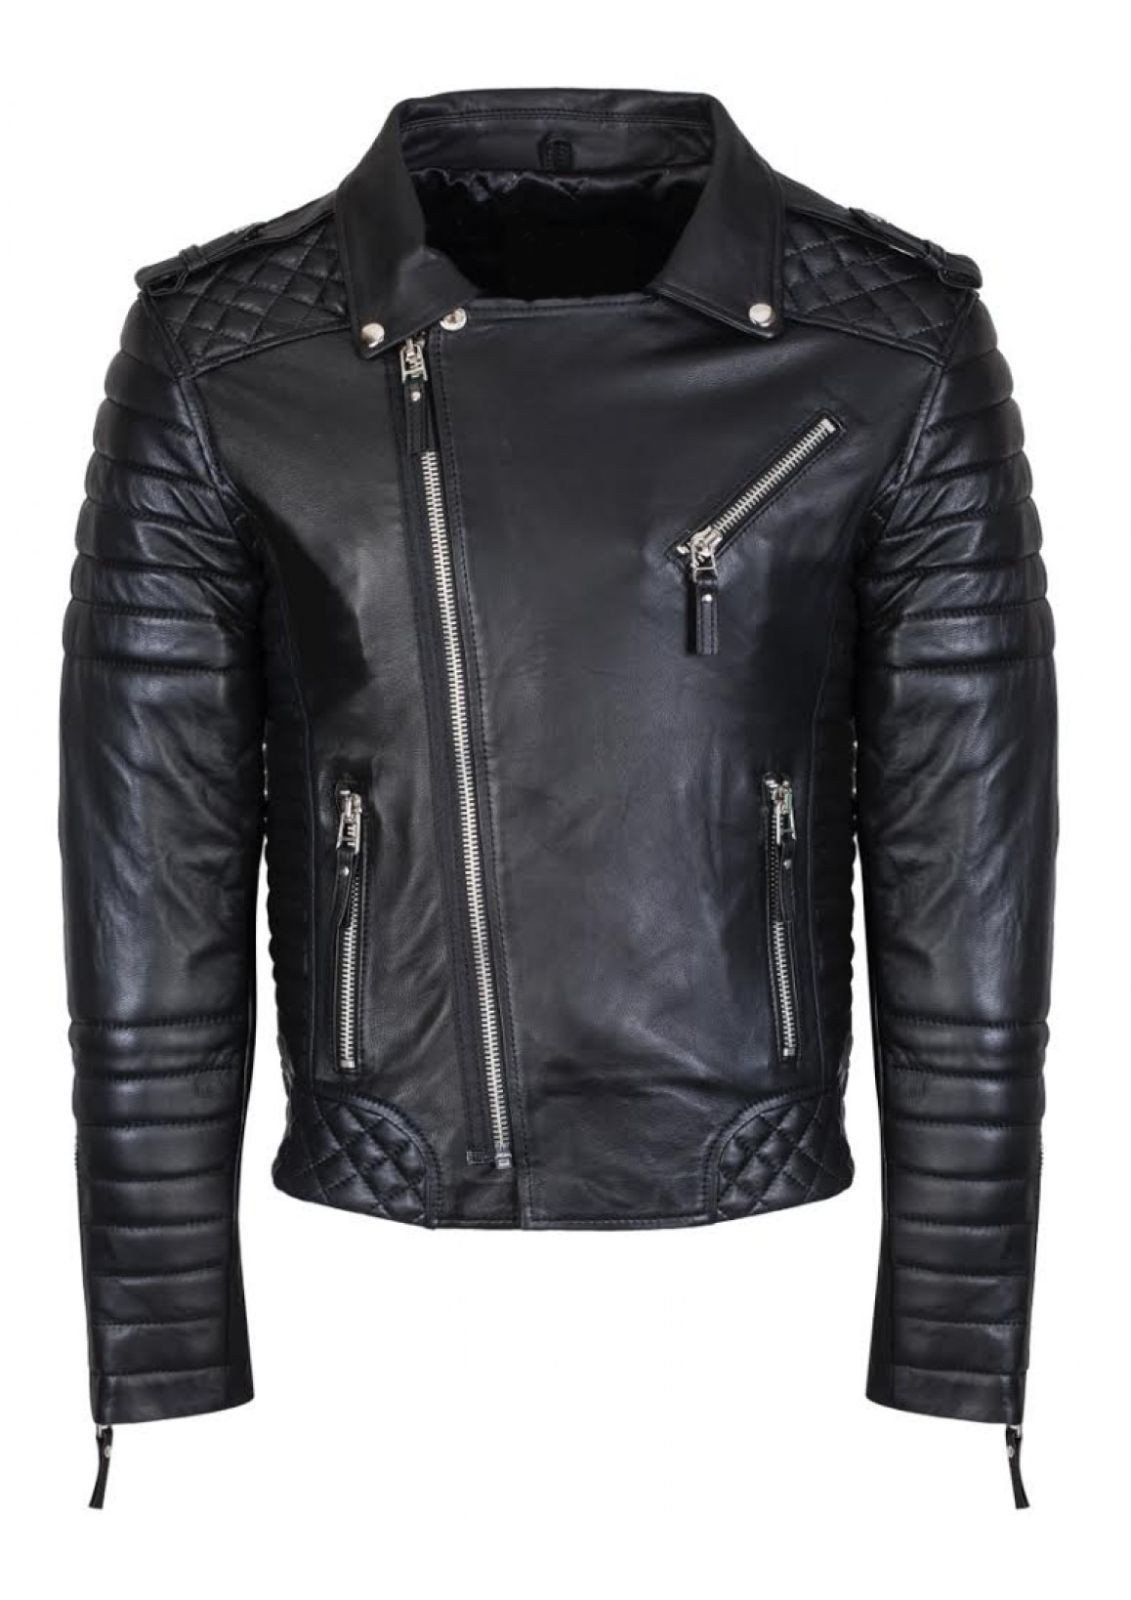 Pin by Pratik Marley on Clothing Leather jacket